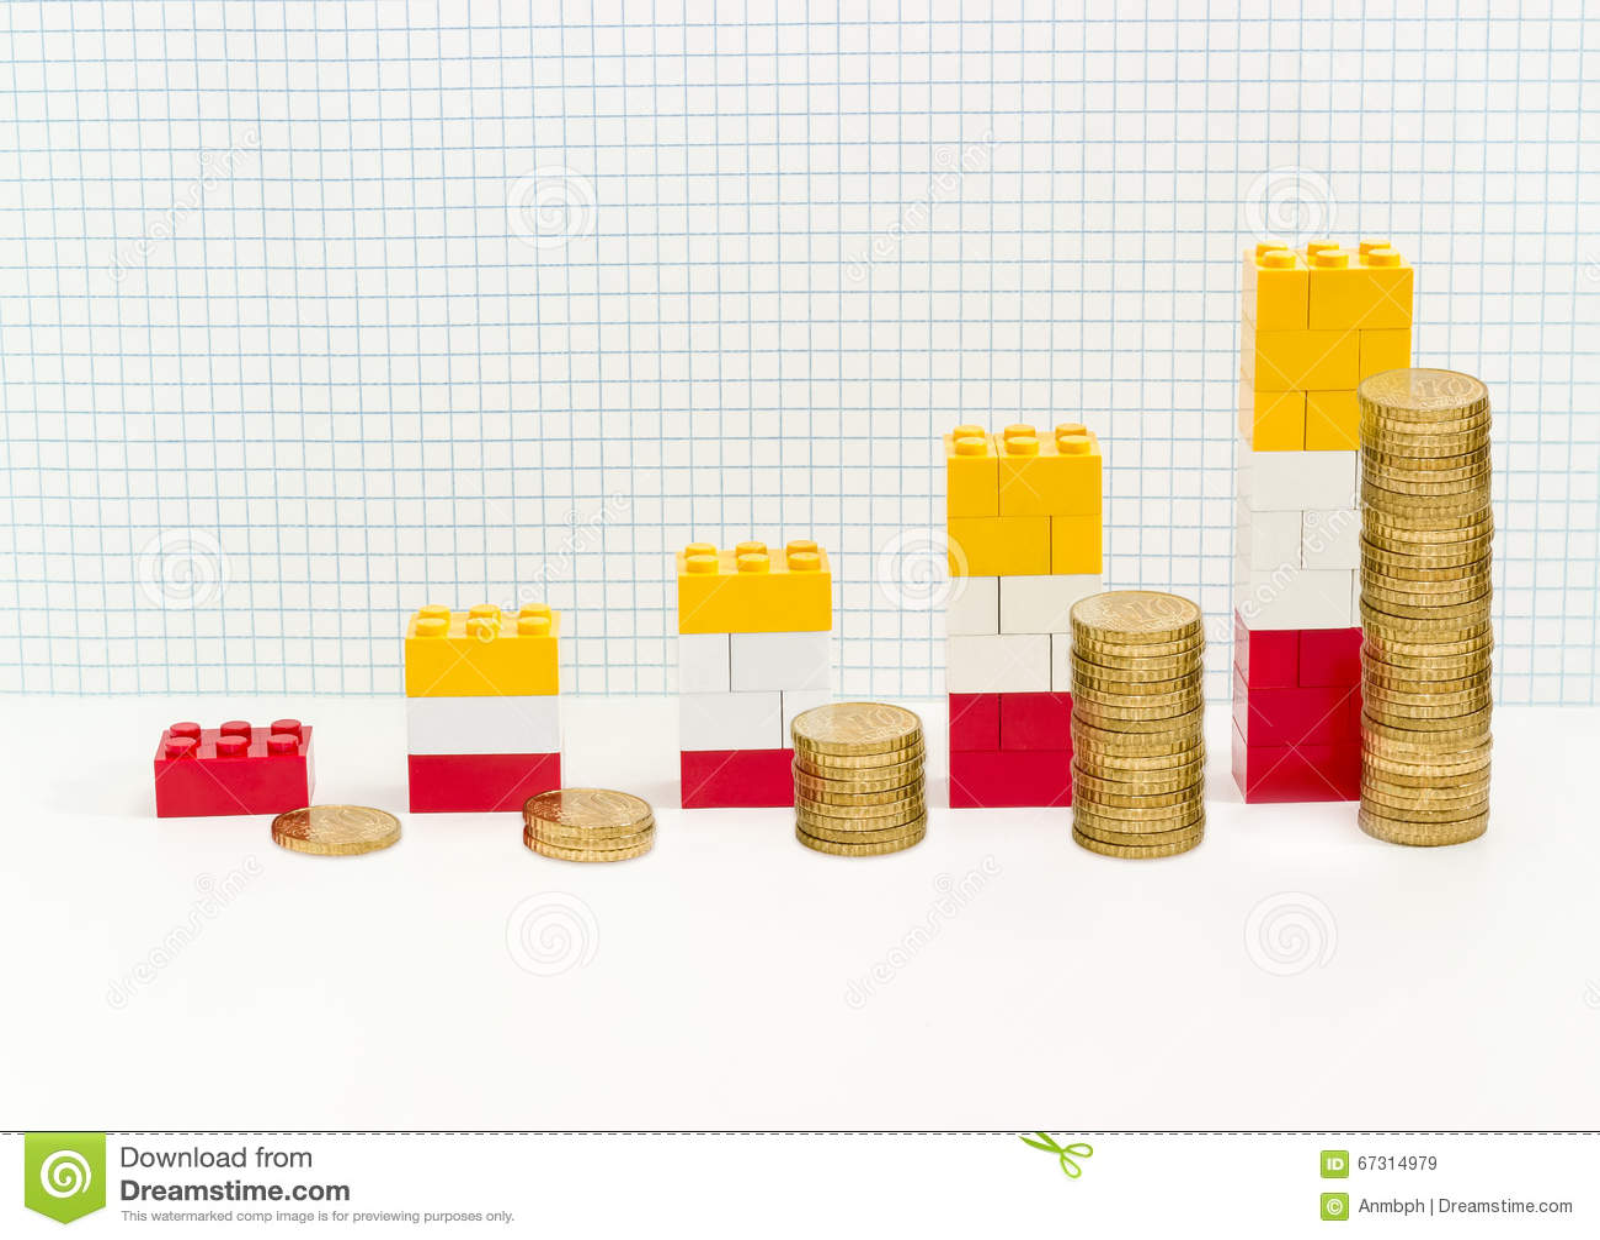 Worksheet Bar Chart For Children worksheet bar chart for children mikyu free made from stacks of coins parts childrens designer children